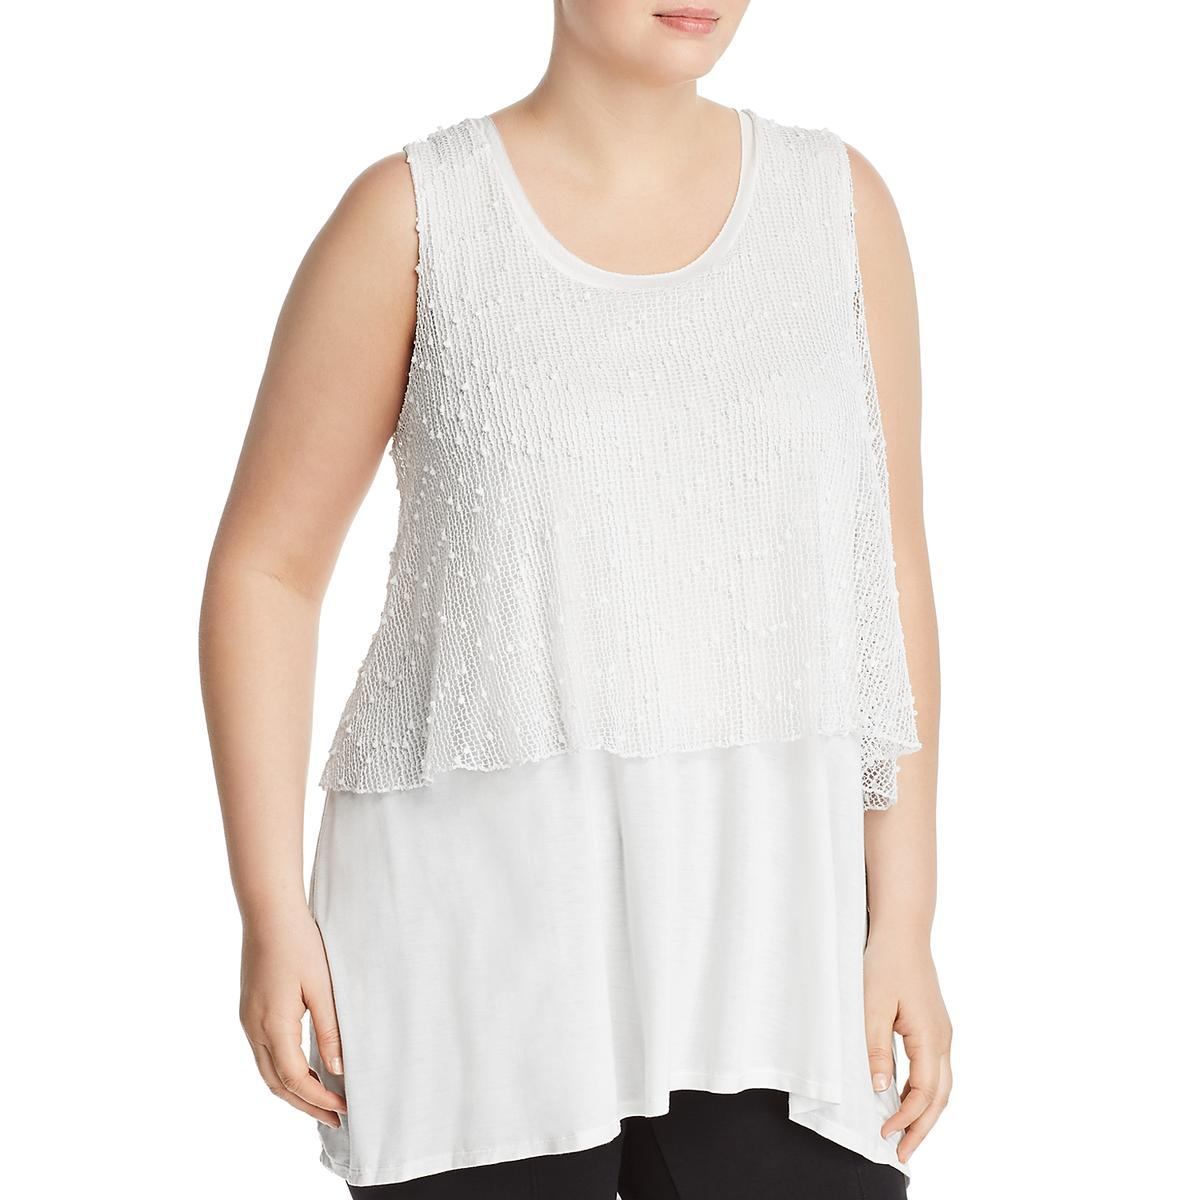 Cupio Womens Sleeveless Mini Hi-Low Tank Dress BHFO 5166